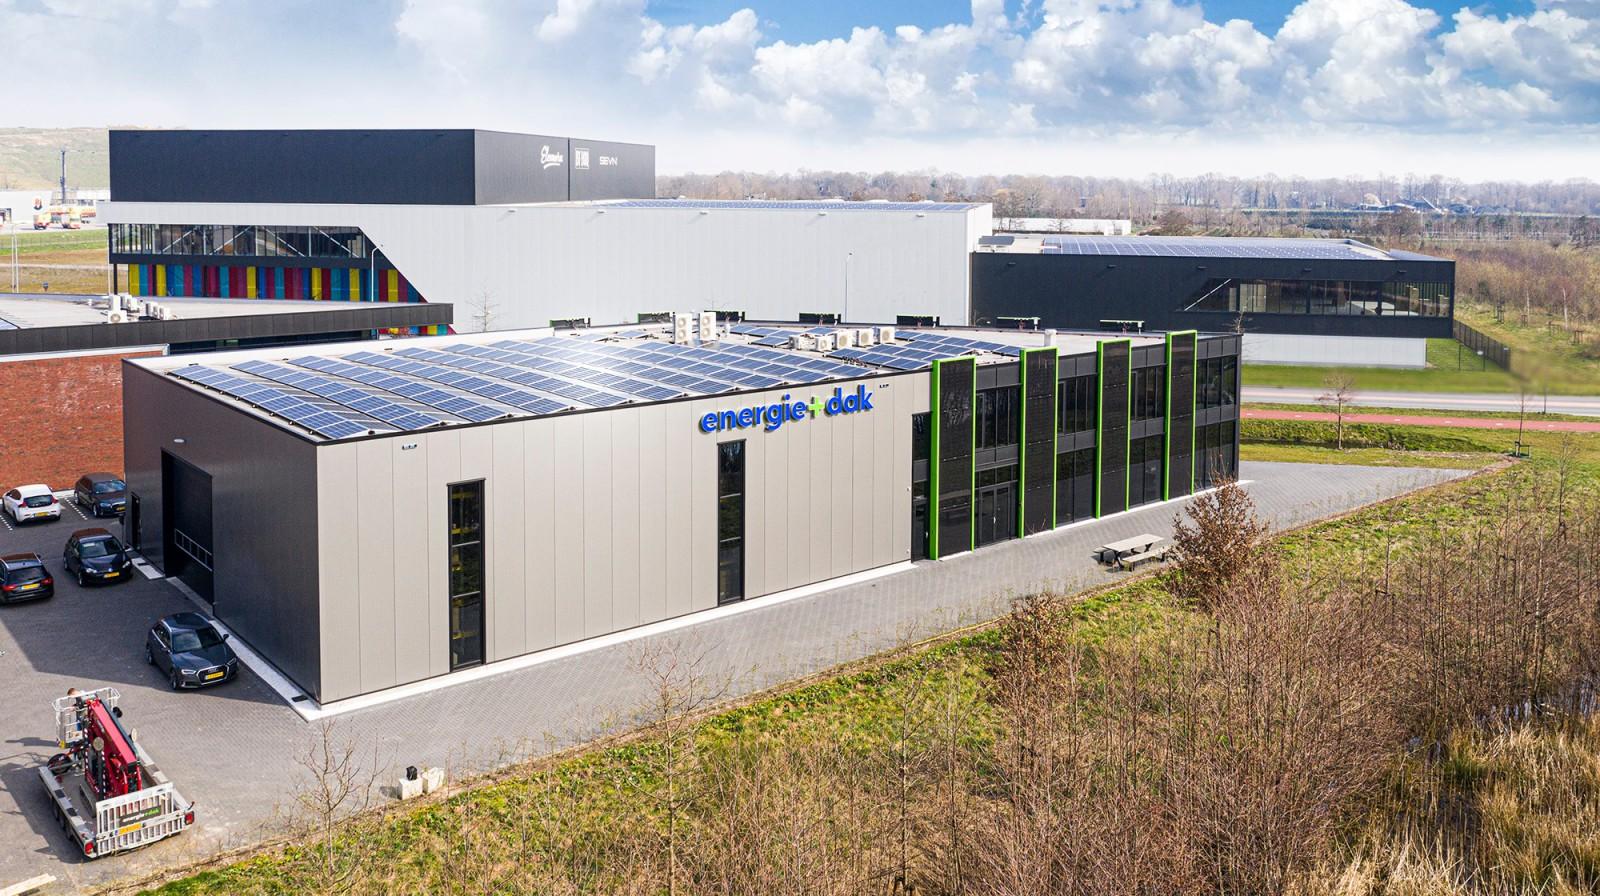 Pand EnergiePlusDak Barneveld + besparen, isoleren, verduurzamen